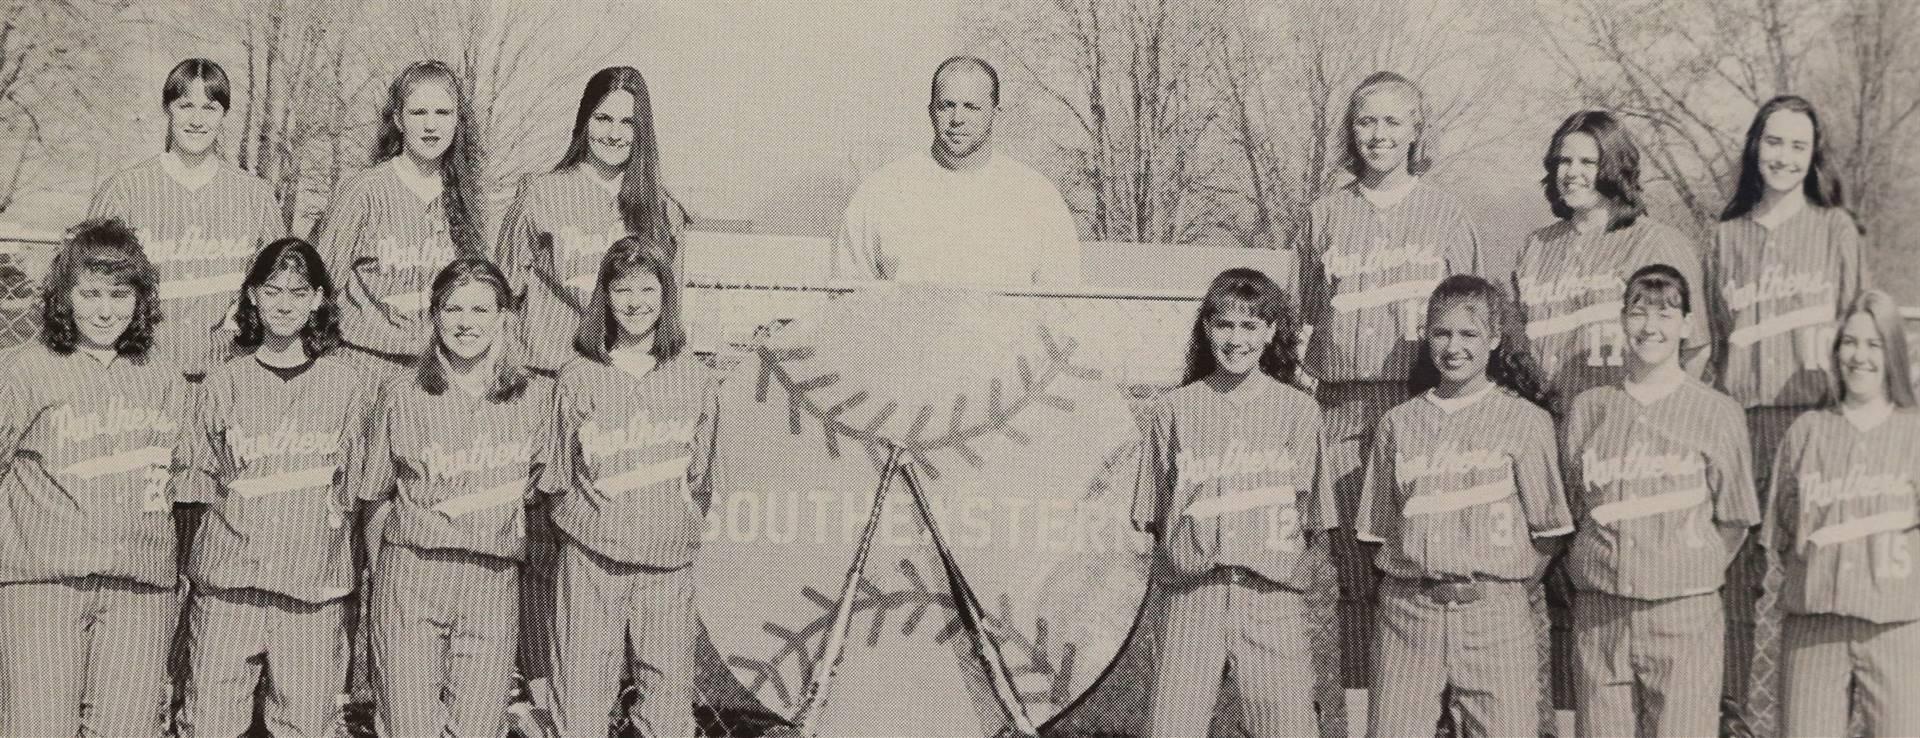 1997 Softball